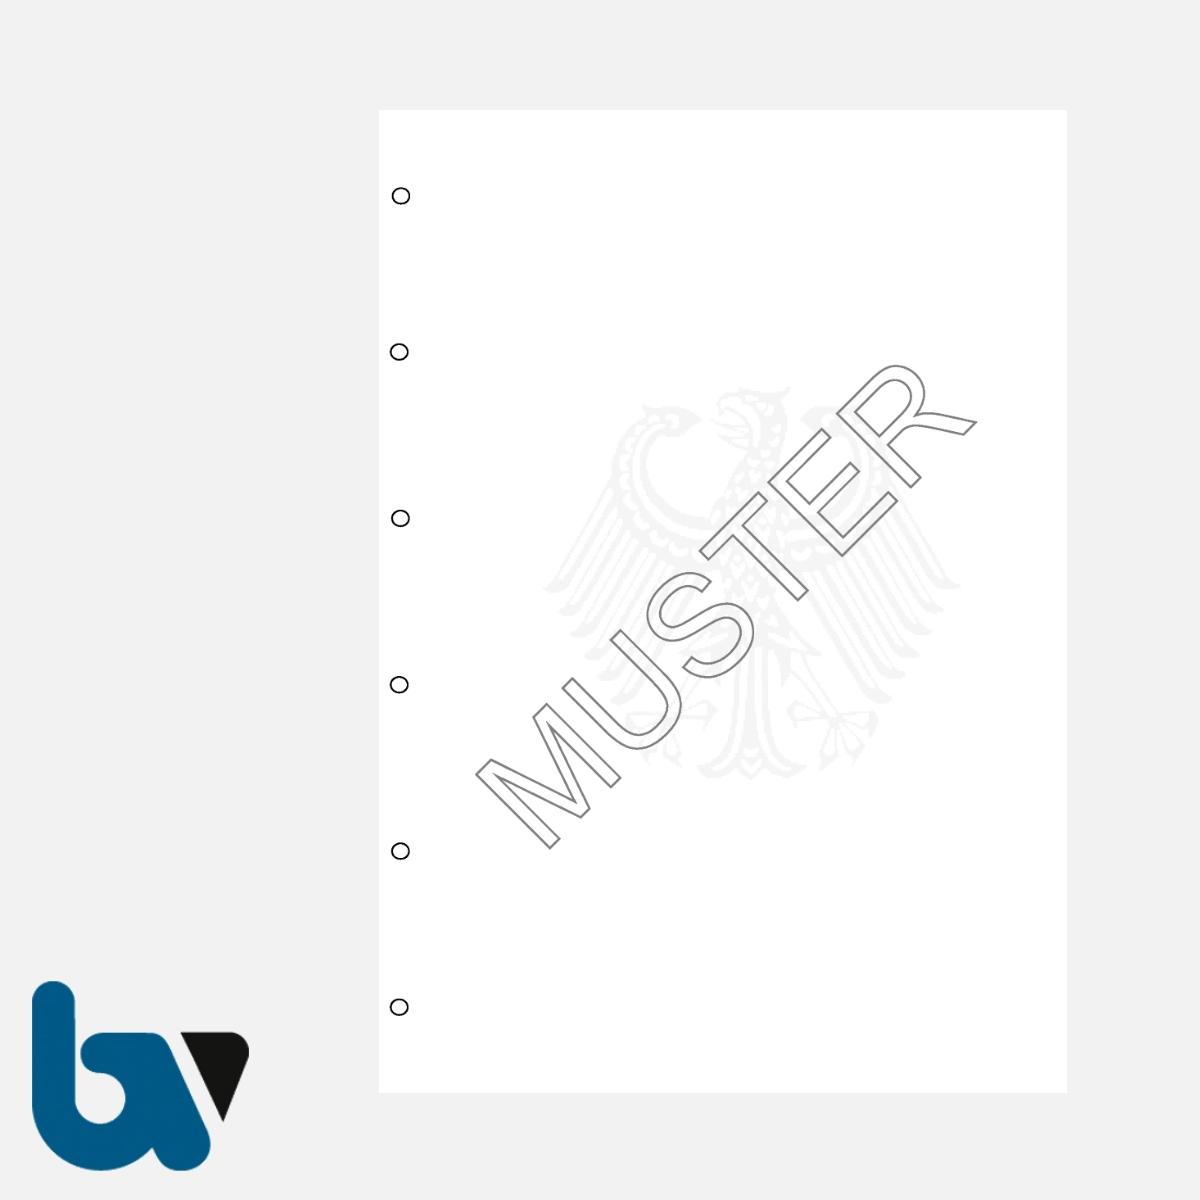 0/168-8gb Urkundenpapier Standesamt Personenstand Urkunde Register Dokument 6-fach Lochung gelocht Bundesadler 100gr Stammbuch Format 130 200 | Borgard Verlag GmbH